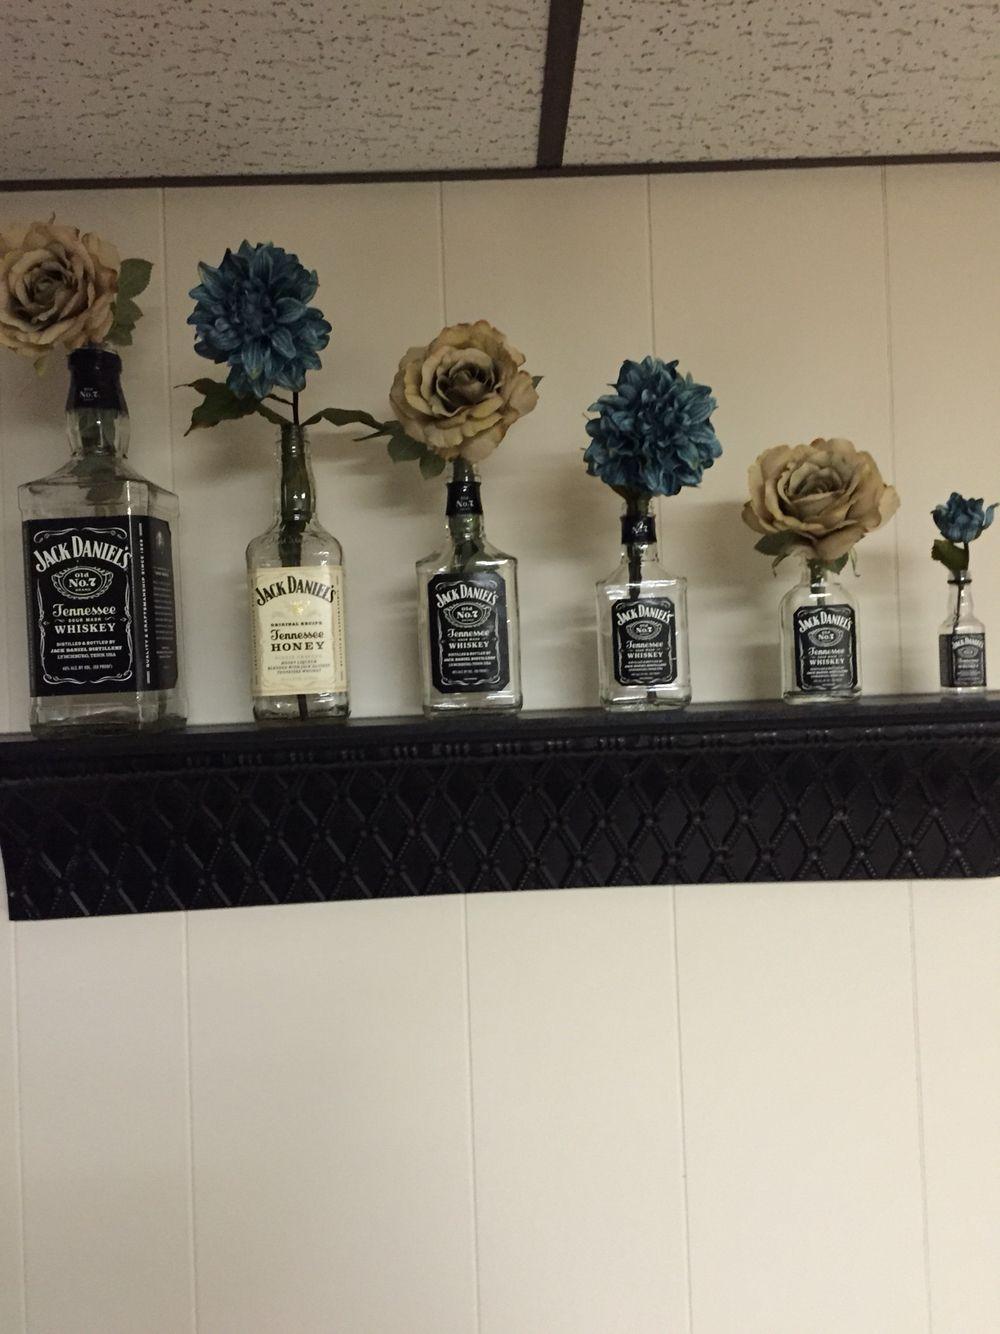 Jack Daniels Bottles And Flowers